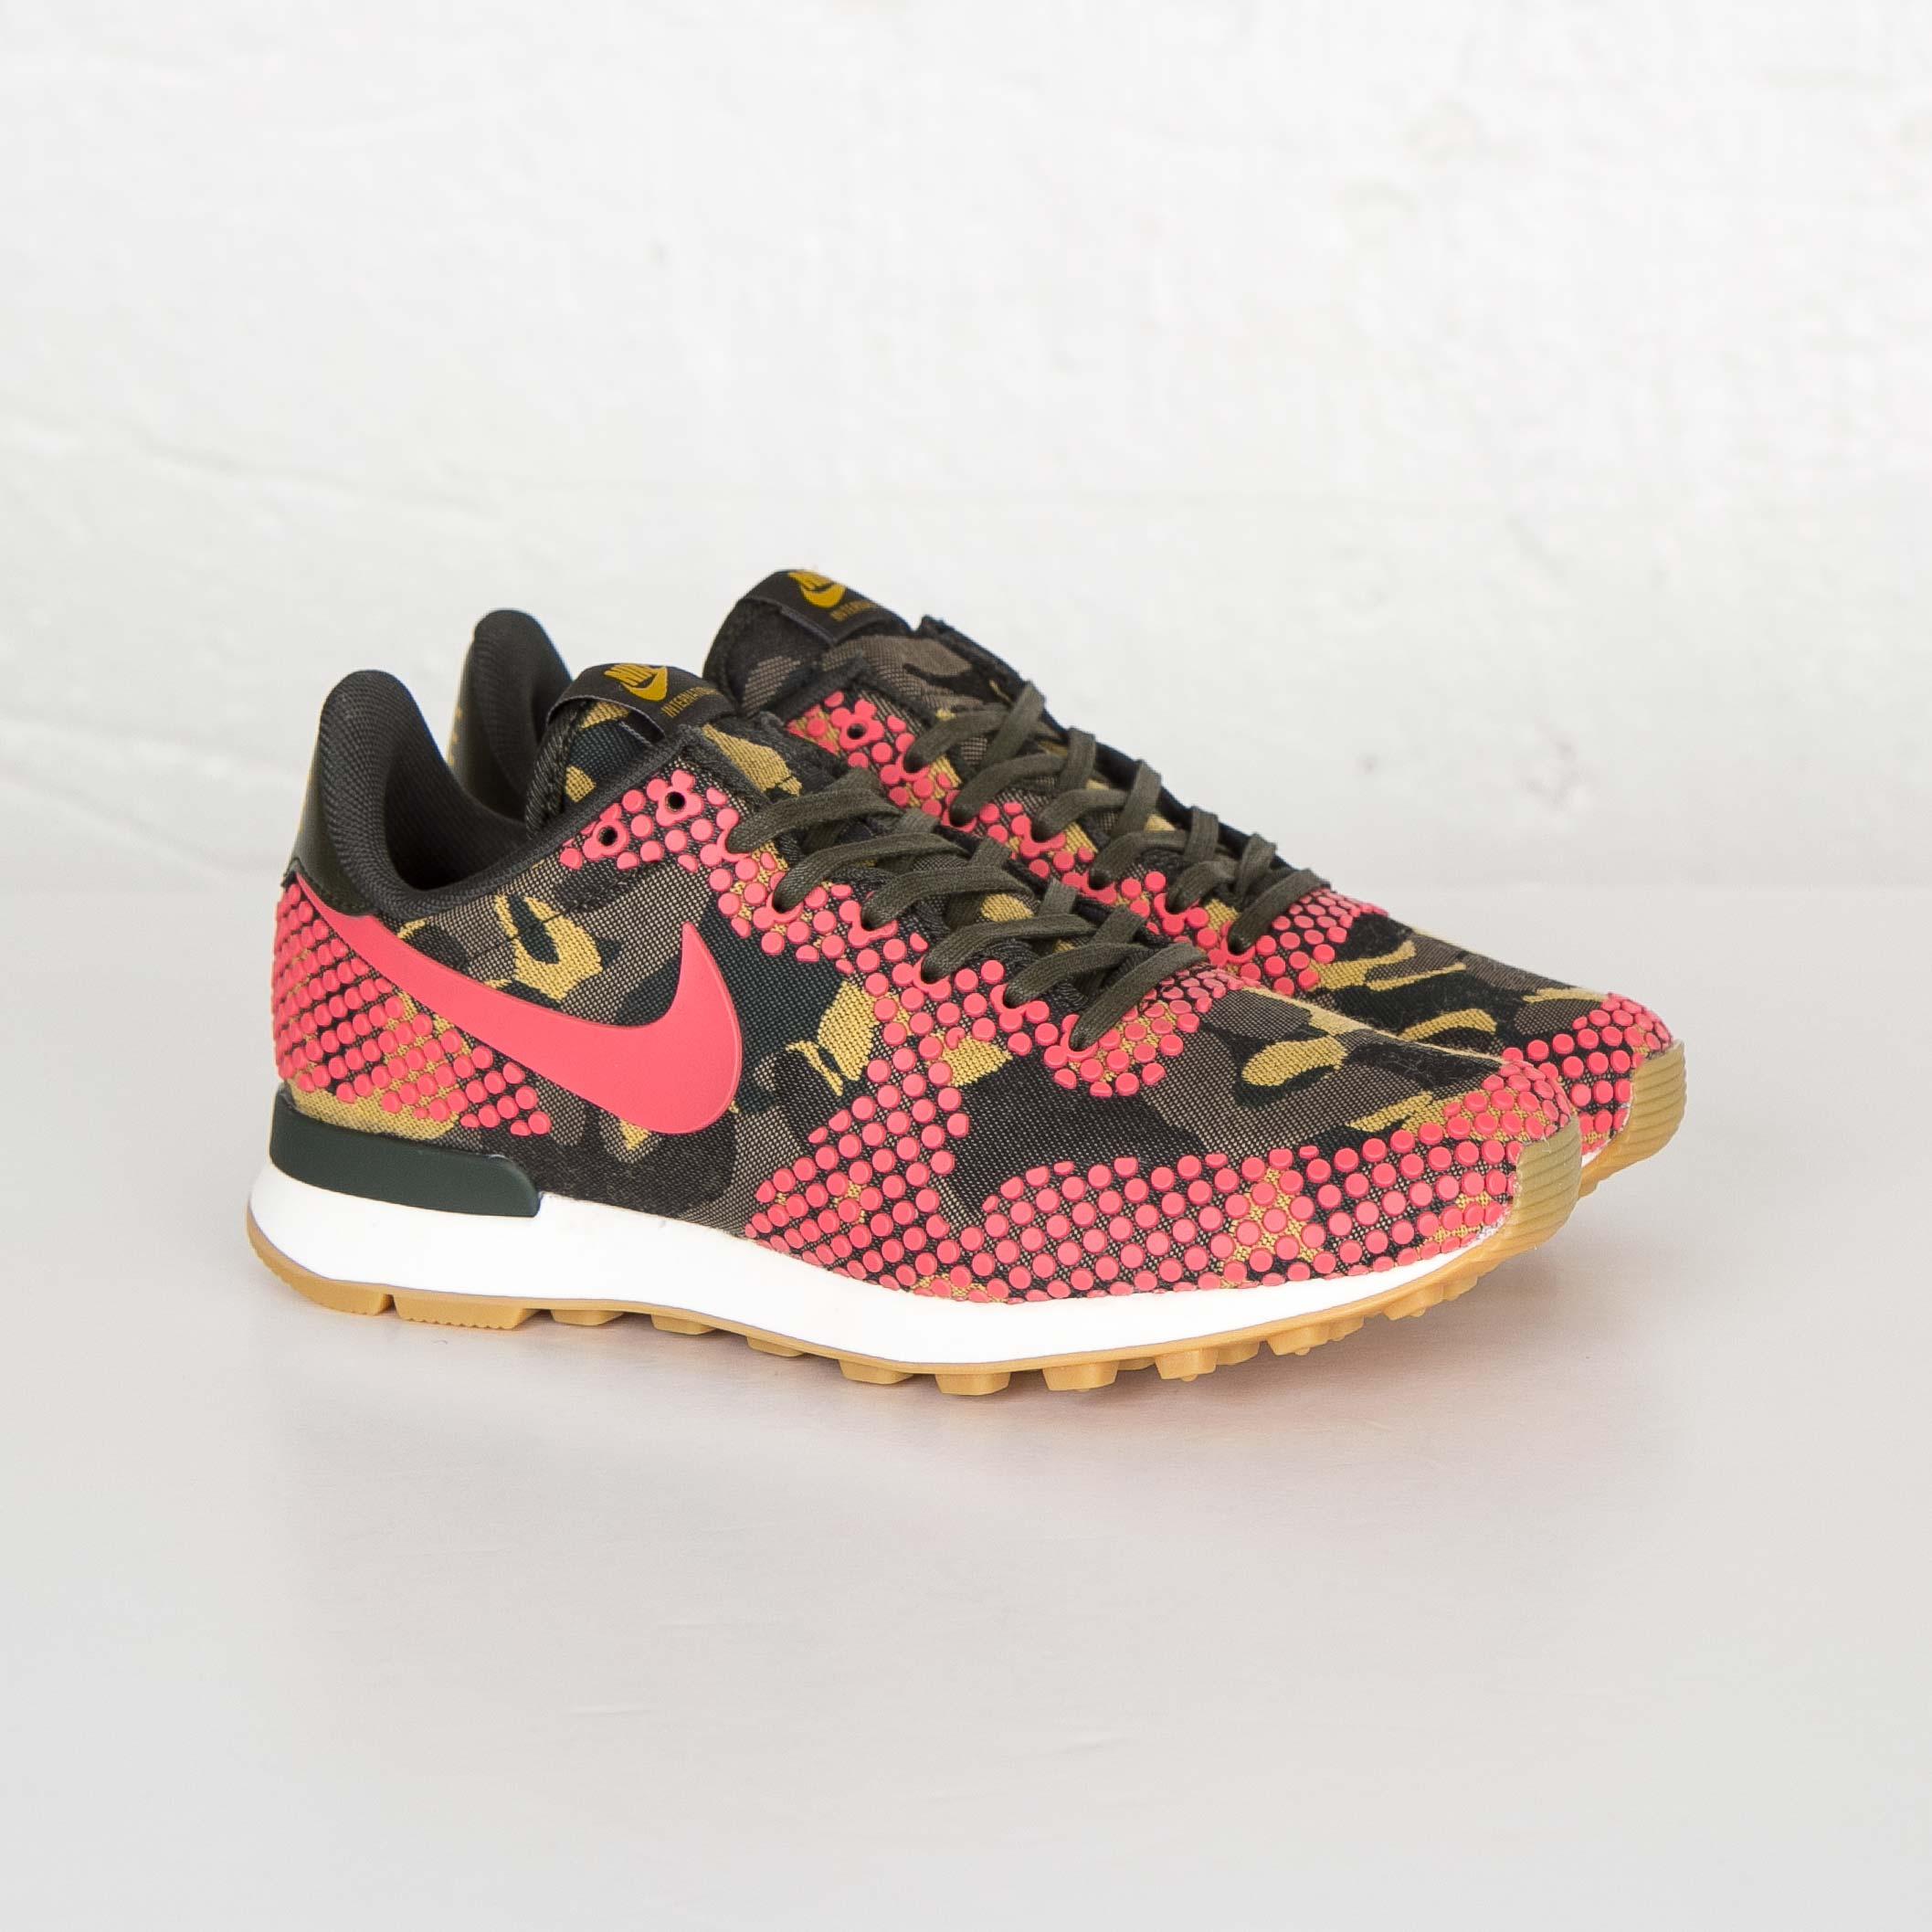 detailing reasonably priced nice shoes Nike W Internationalist Jacquard Premium - 807407-200 ...